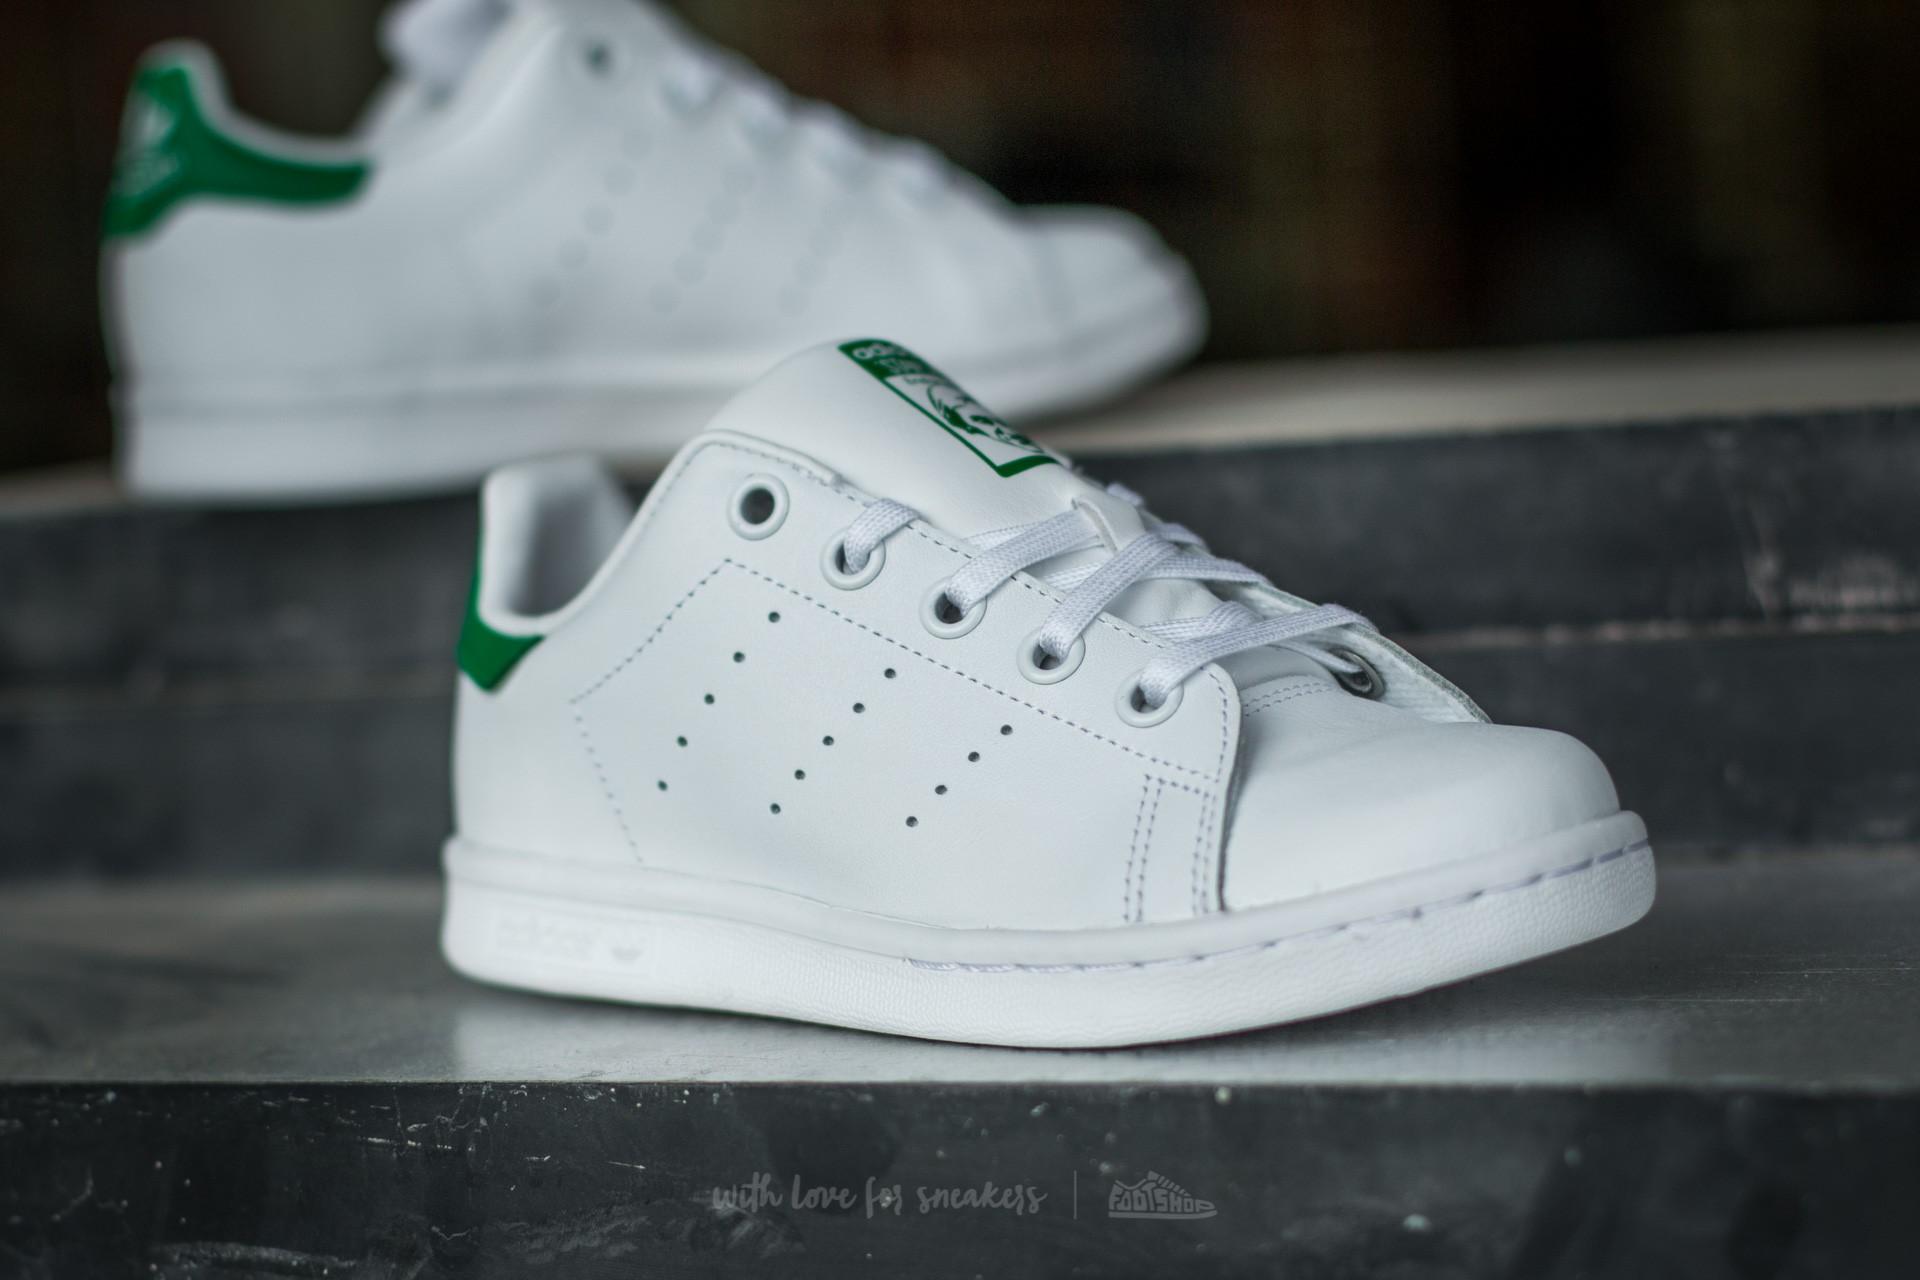 adidas stan smith green - lecorcedorange.com f8eb79e941c6